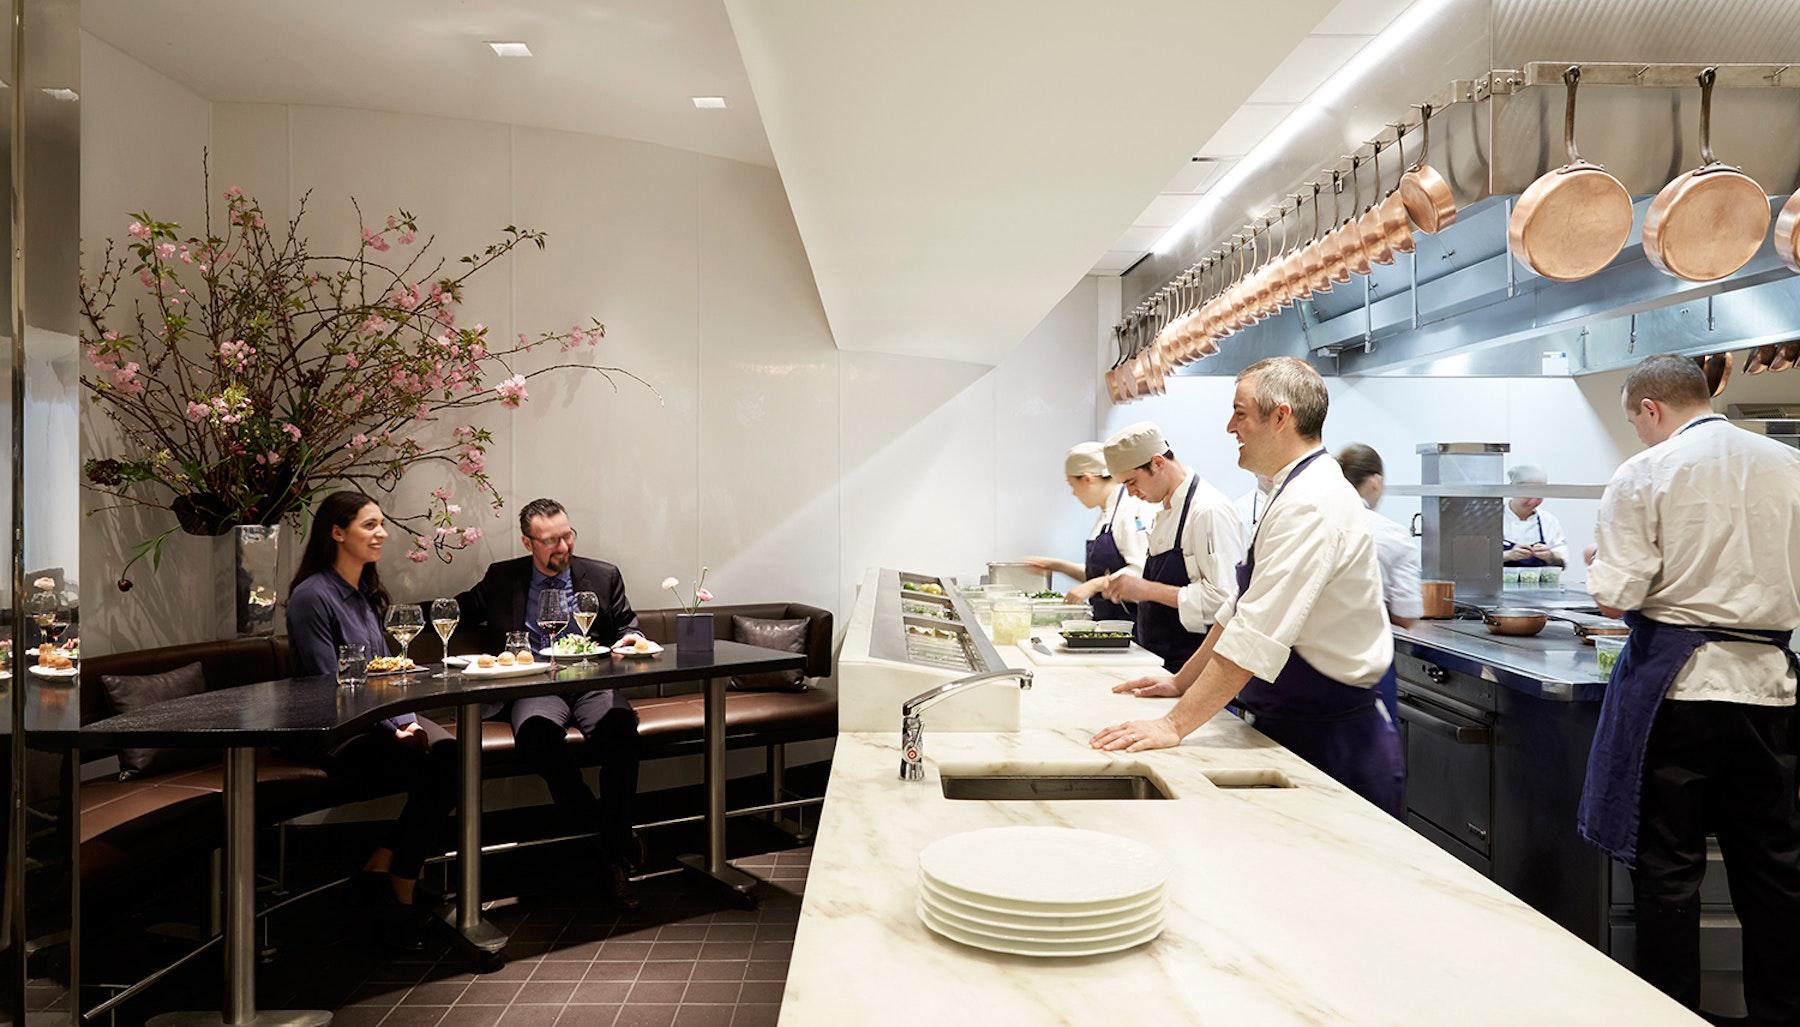 Restaurant Kitchen Table the modern - kitchen table